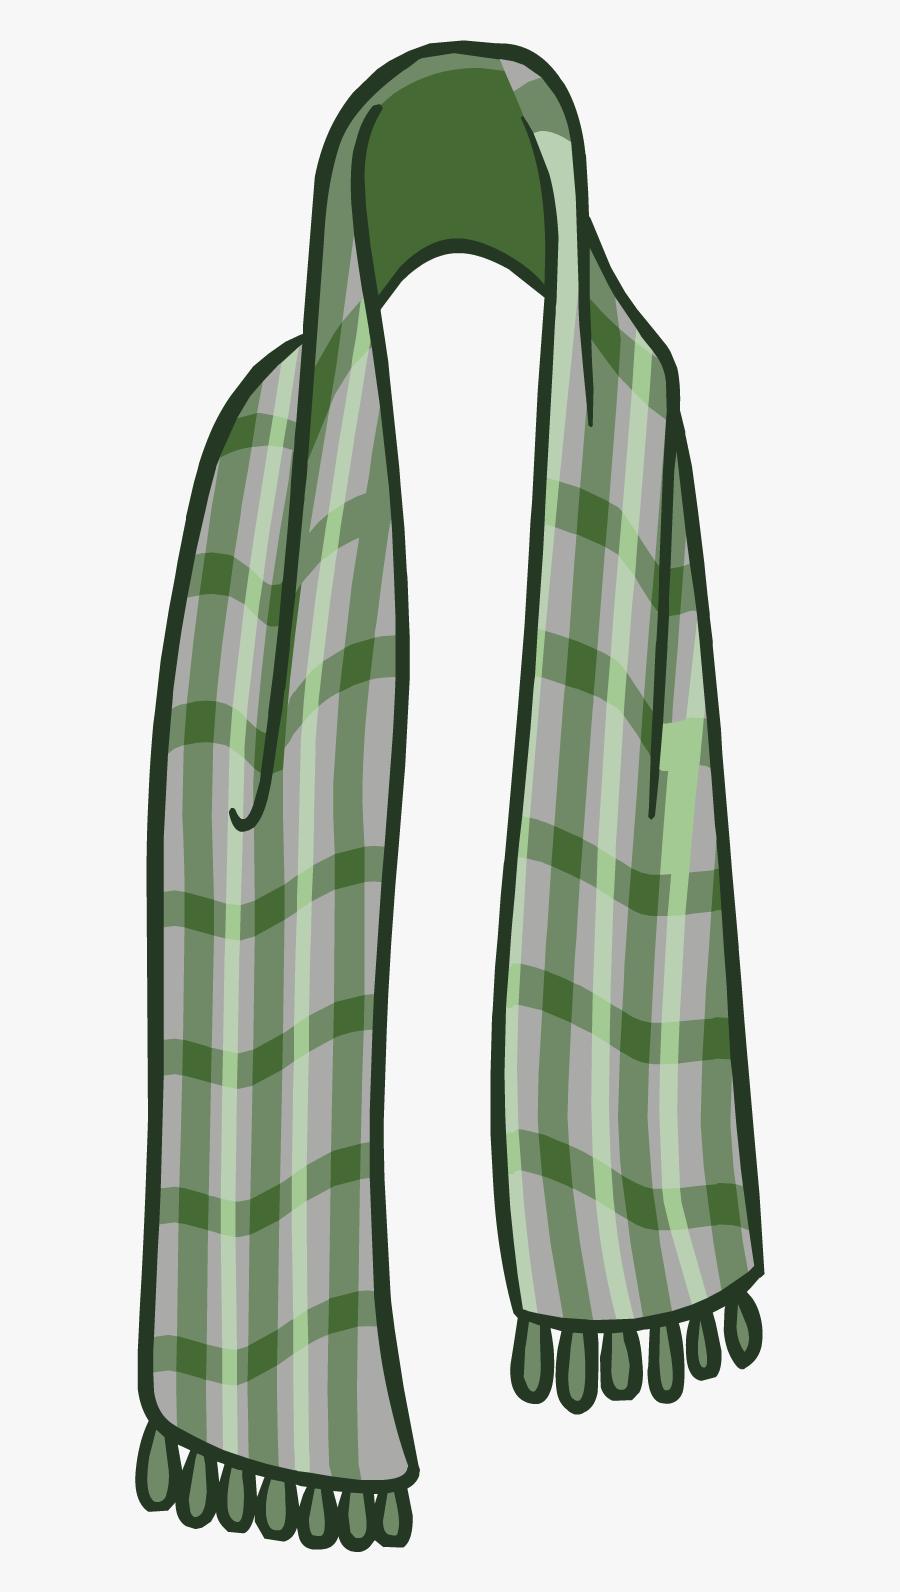 Club Penguin Wiki - Club Penguin Green Scarf, Transparent Clipart